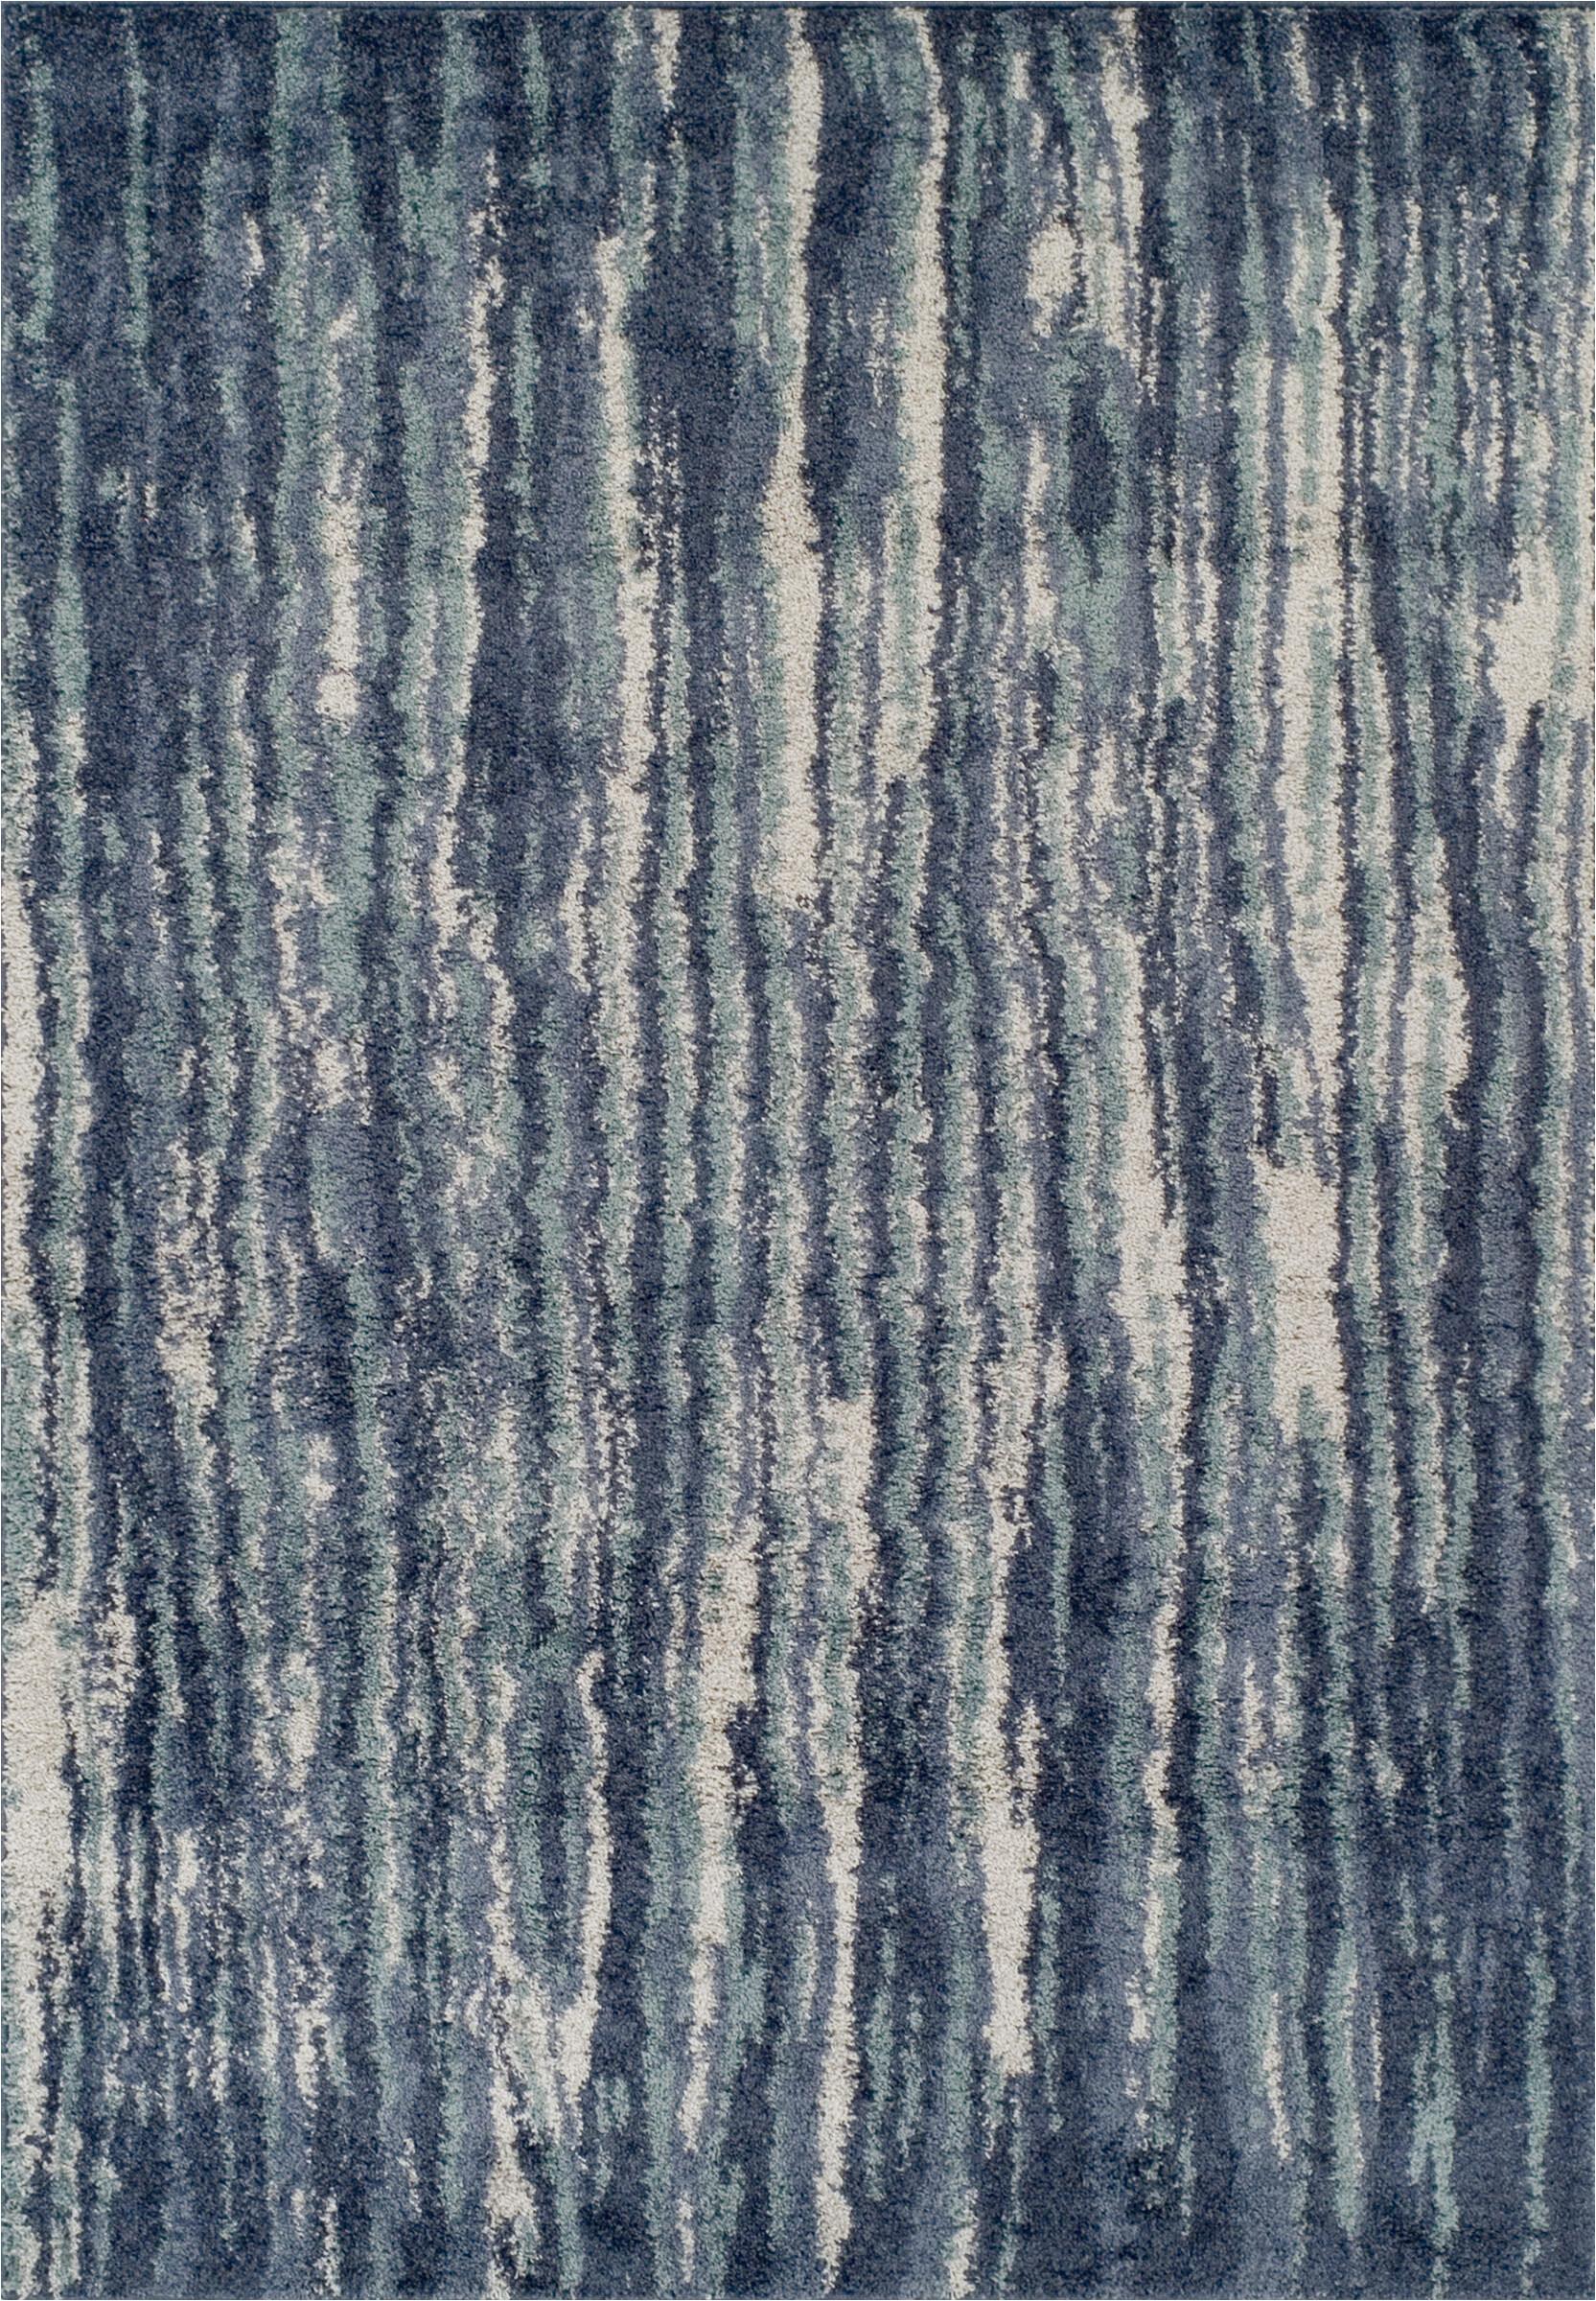 samella abstract bluegray area rug